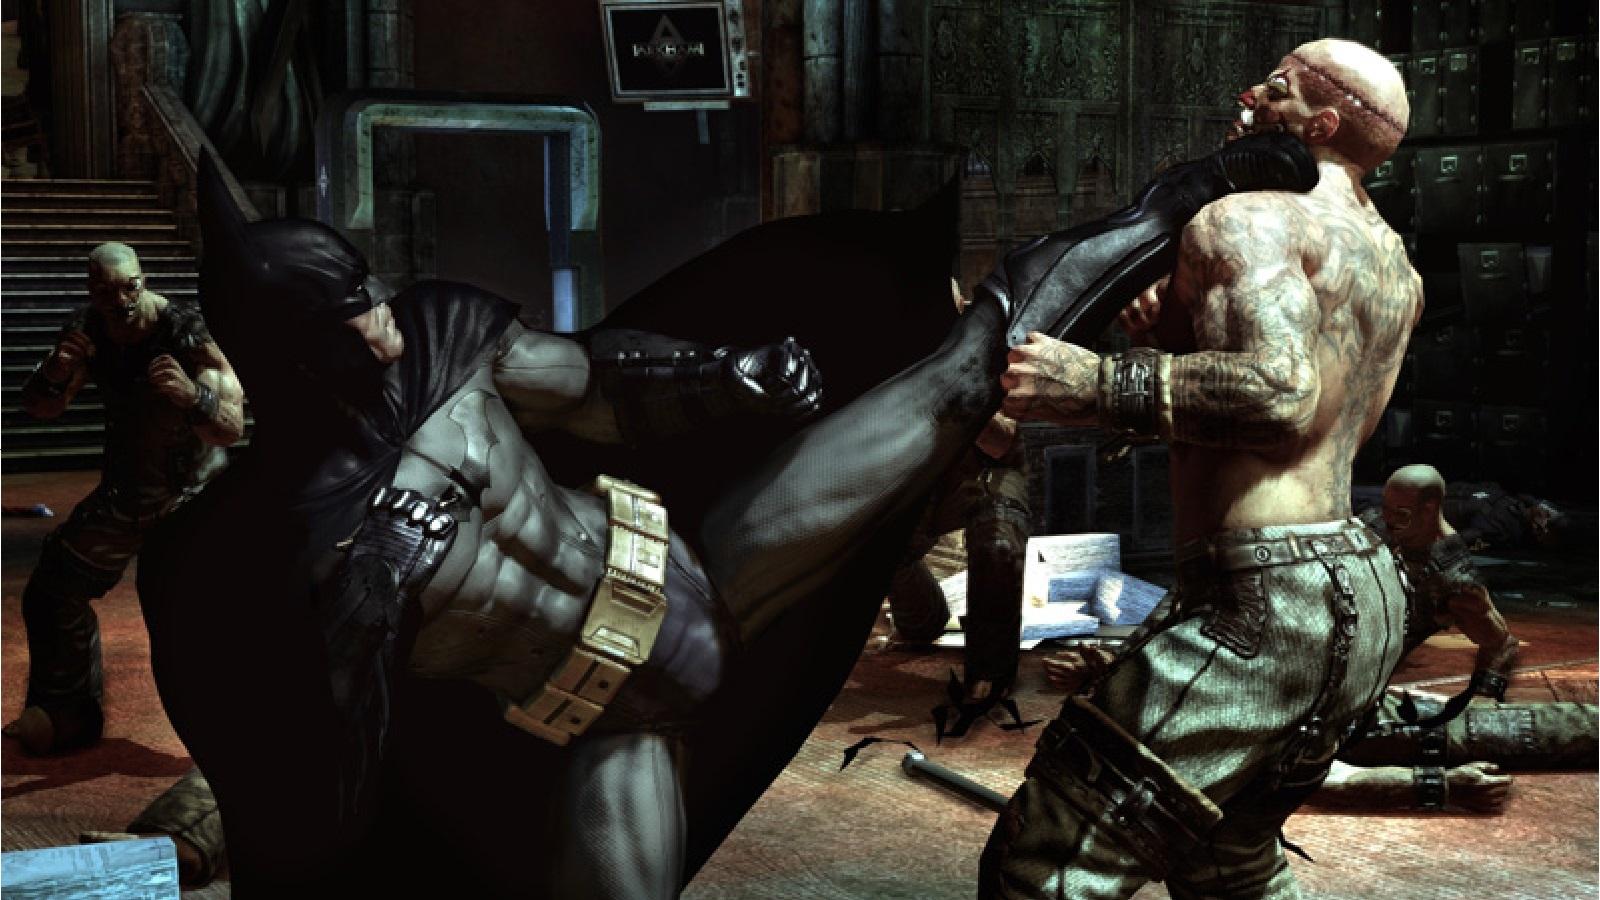 Game image Batman Arkham Asylum